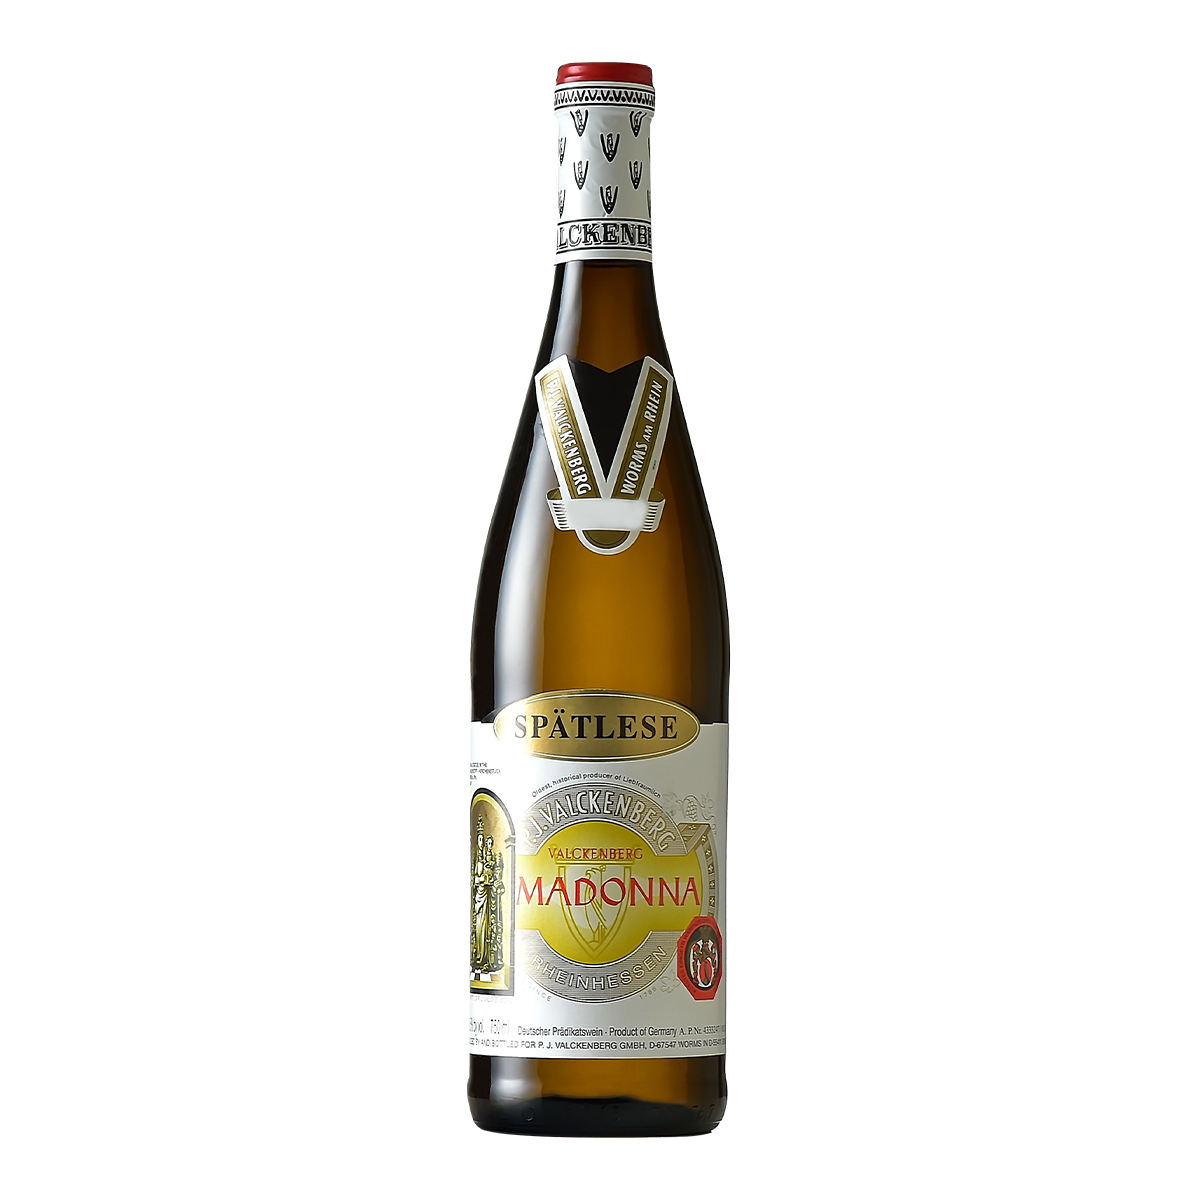 DEV2103 德國范根堡瑪丹娜2014遲摘高級白葡萄酒 P. J. Valckenberg MADONNA Spätlese (微甜) (750ML)